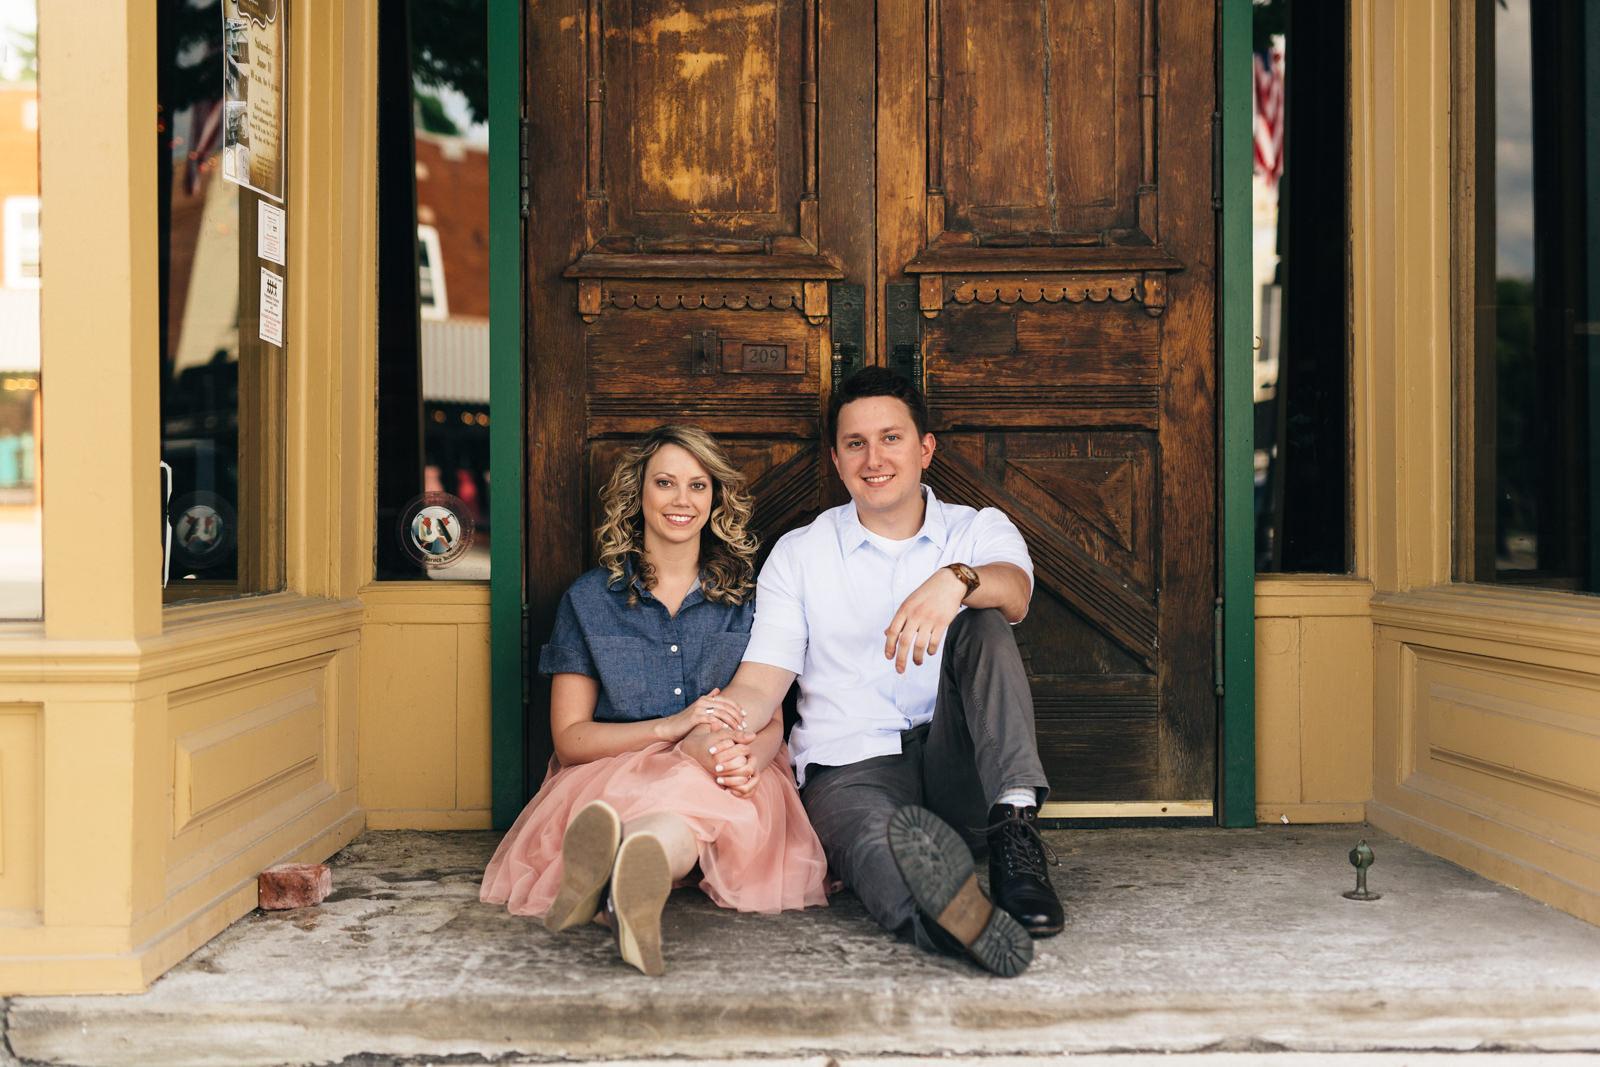 Couple sitting in front of historical wooden door in downtown Perrysburg, Ohio.